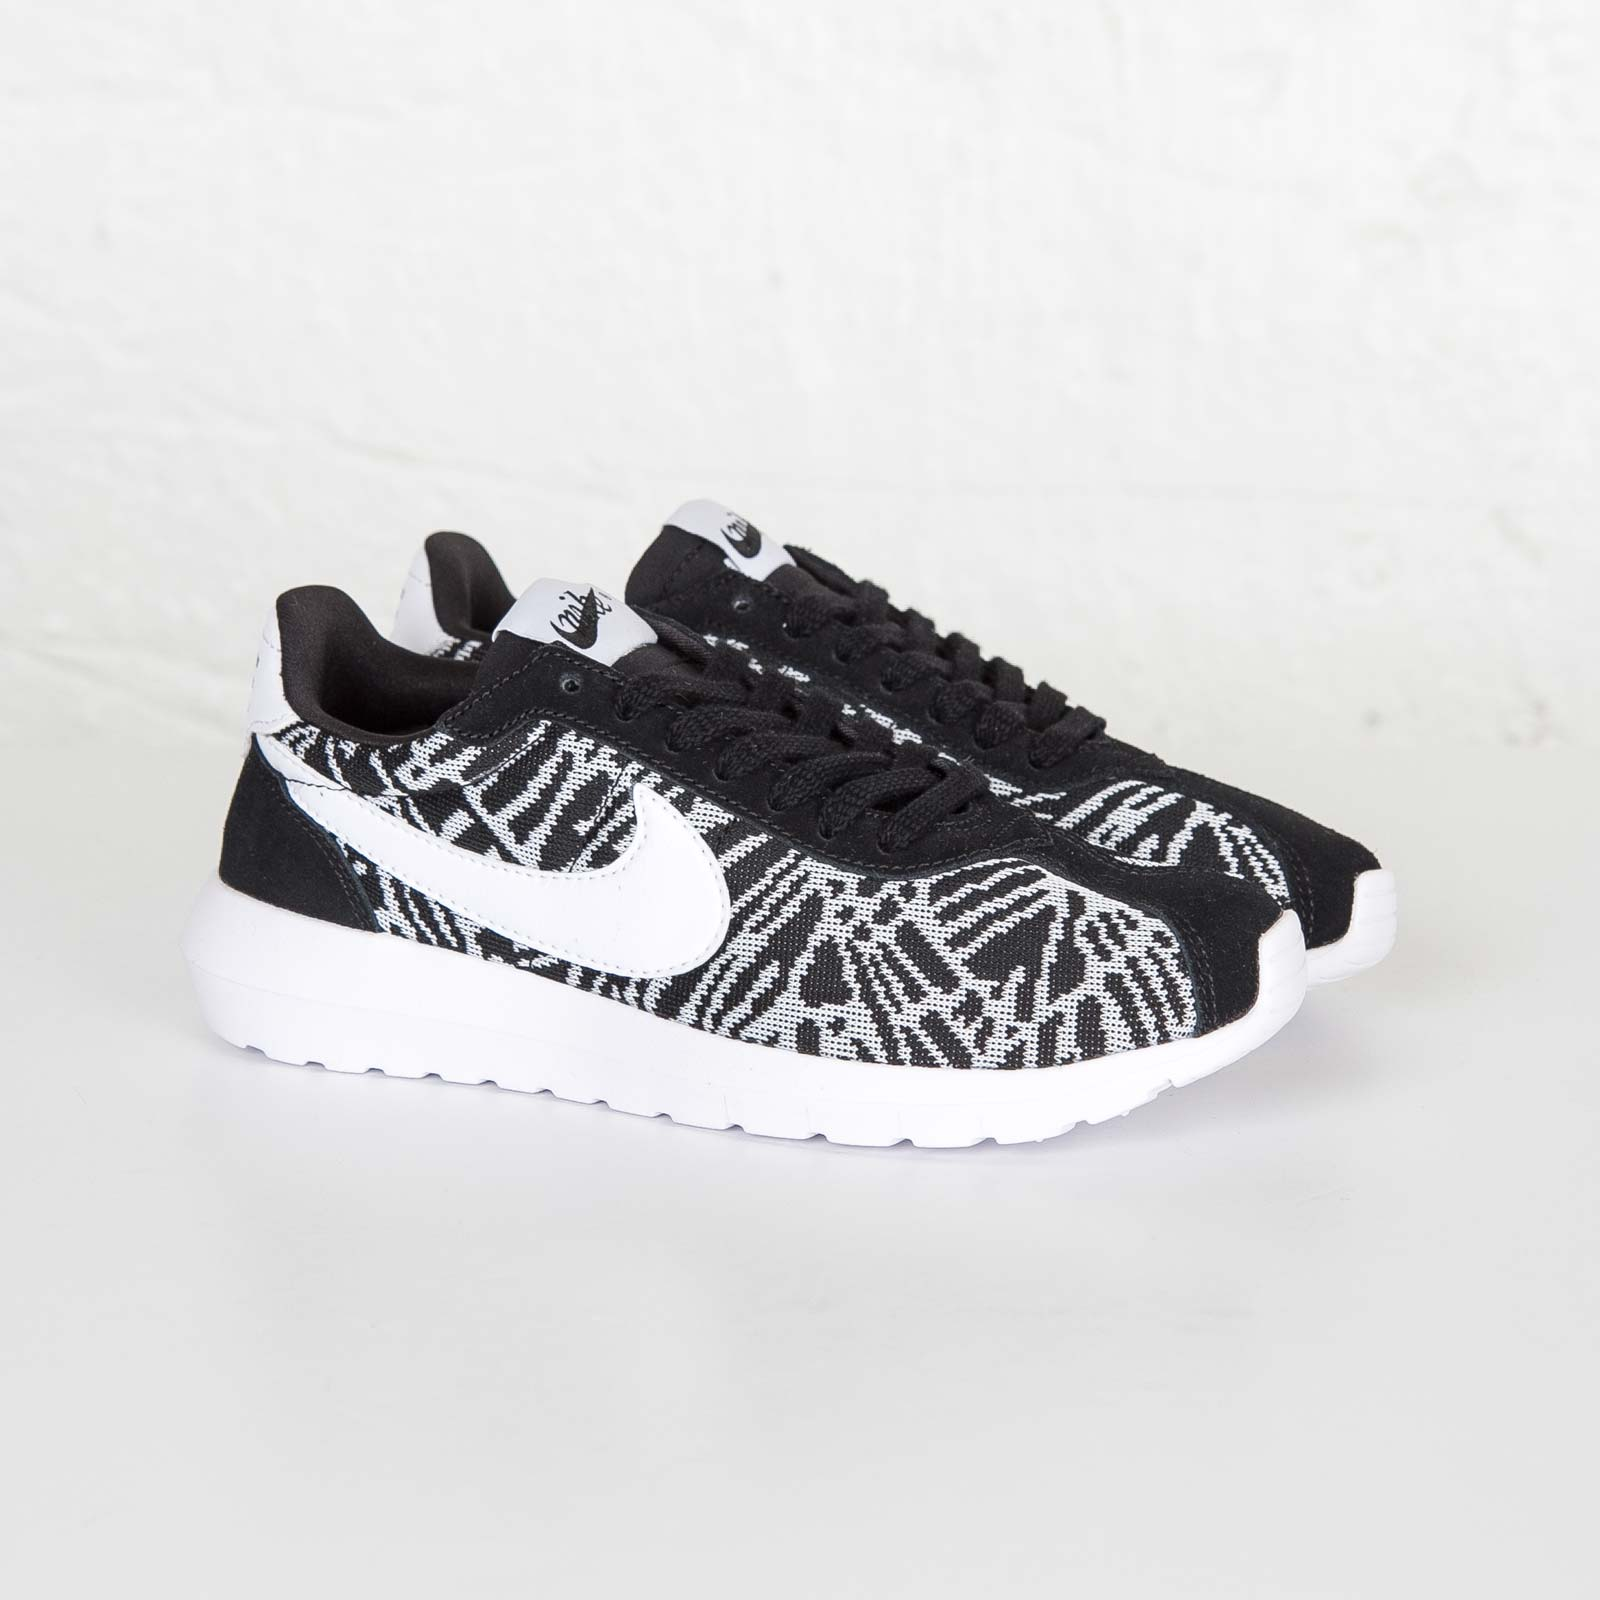 info for bfa2a f4798 Nike Roshe LD-1000 Knit Jacquard